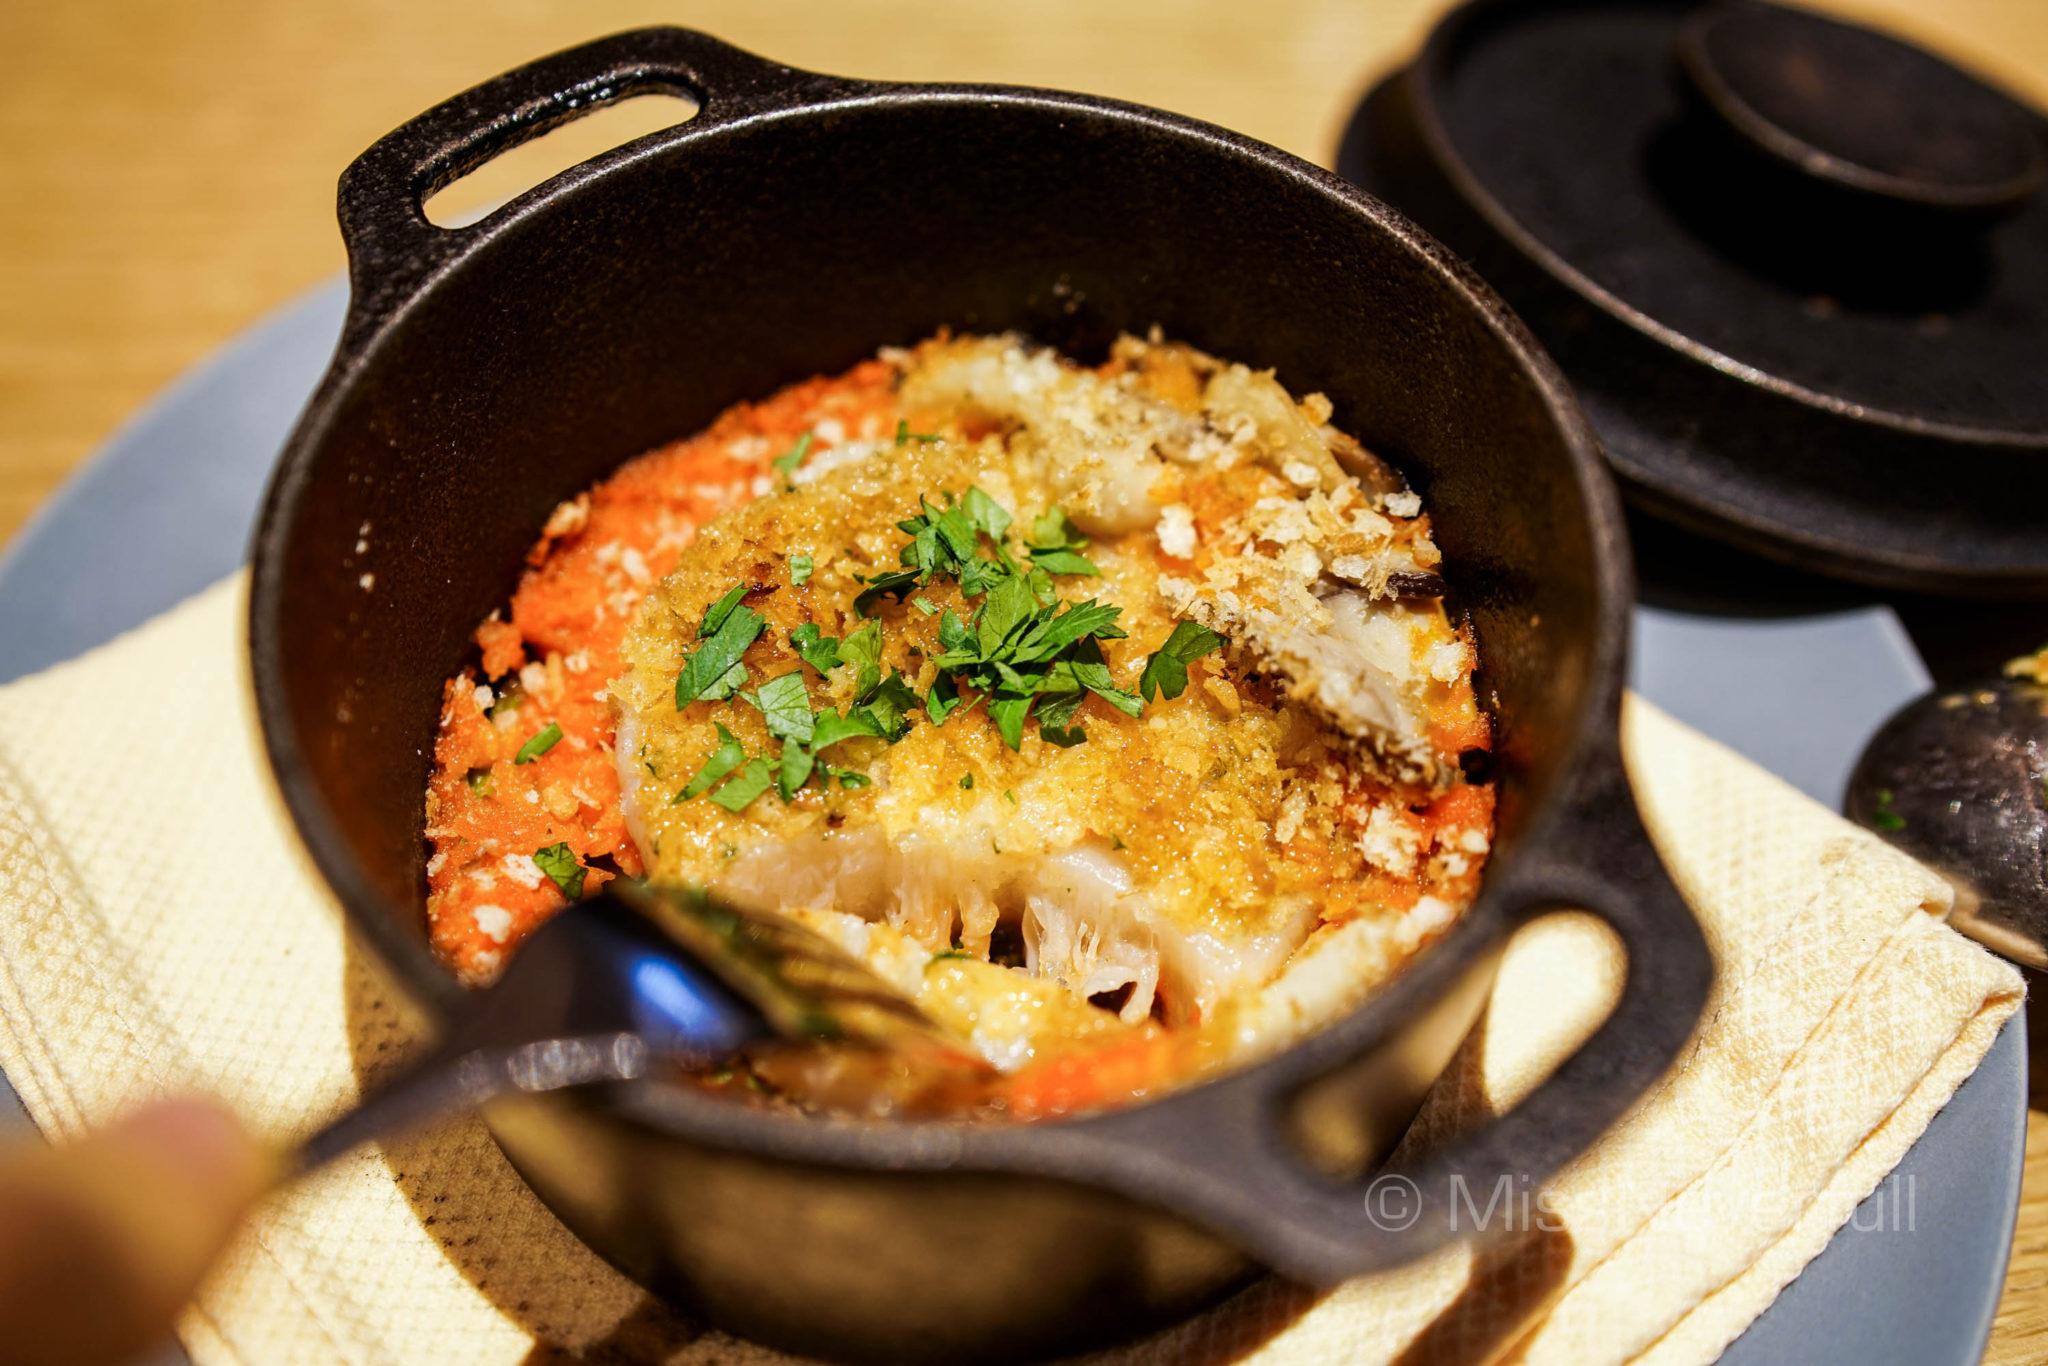 Scallop from Salfutu, Mushroom, Garlic Gratin